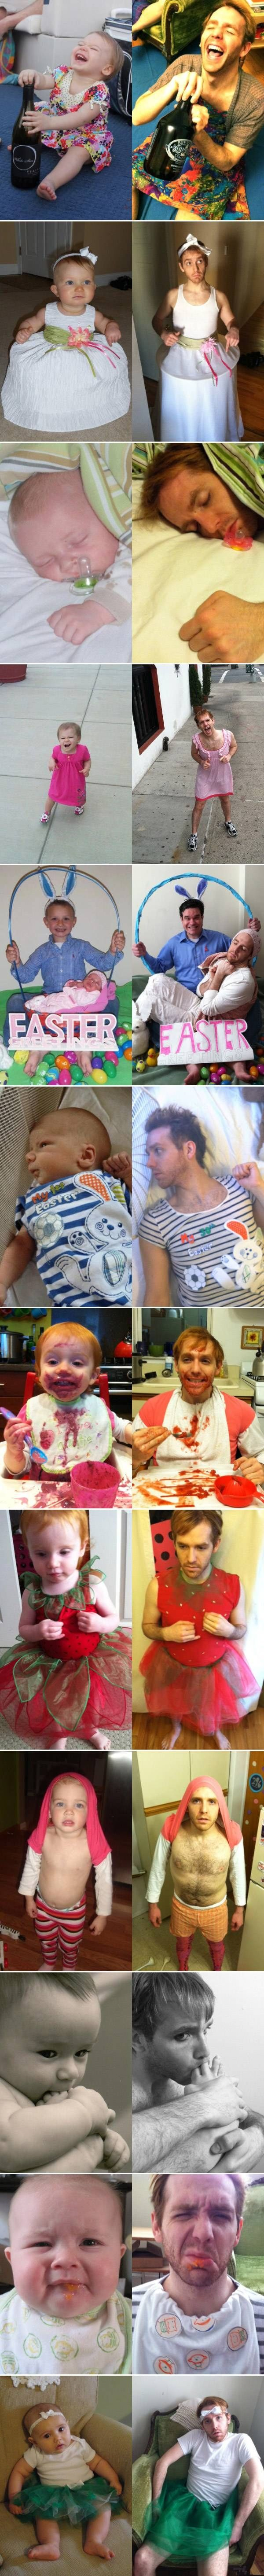 One man's journey to recreate his girlfriend's baby photos..... hahaha